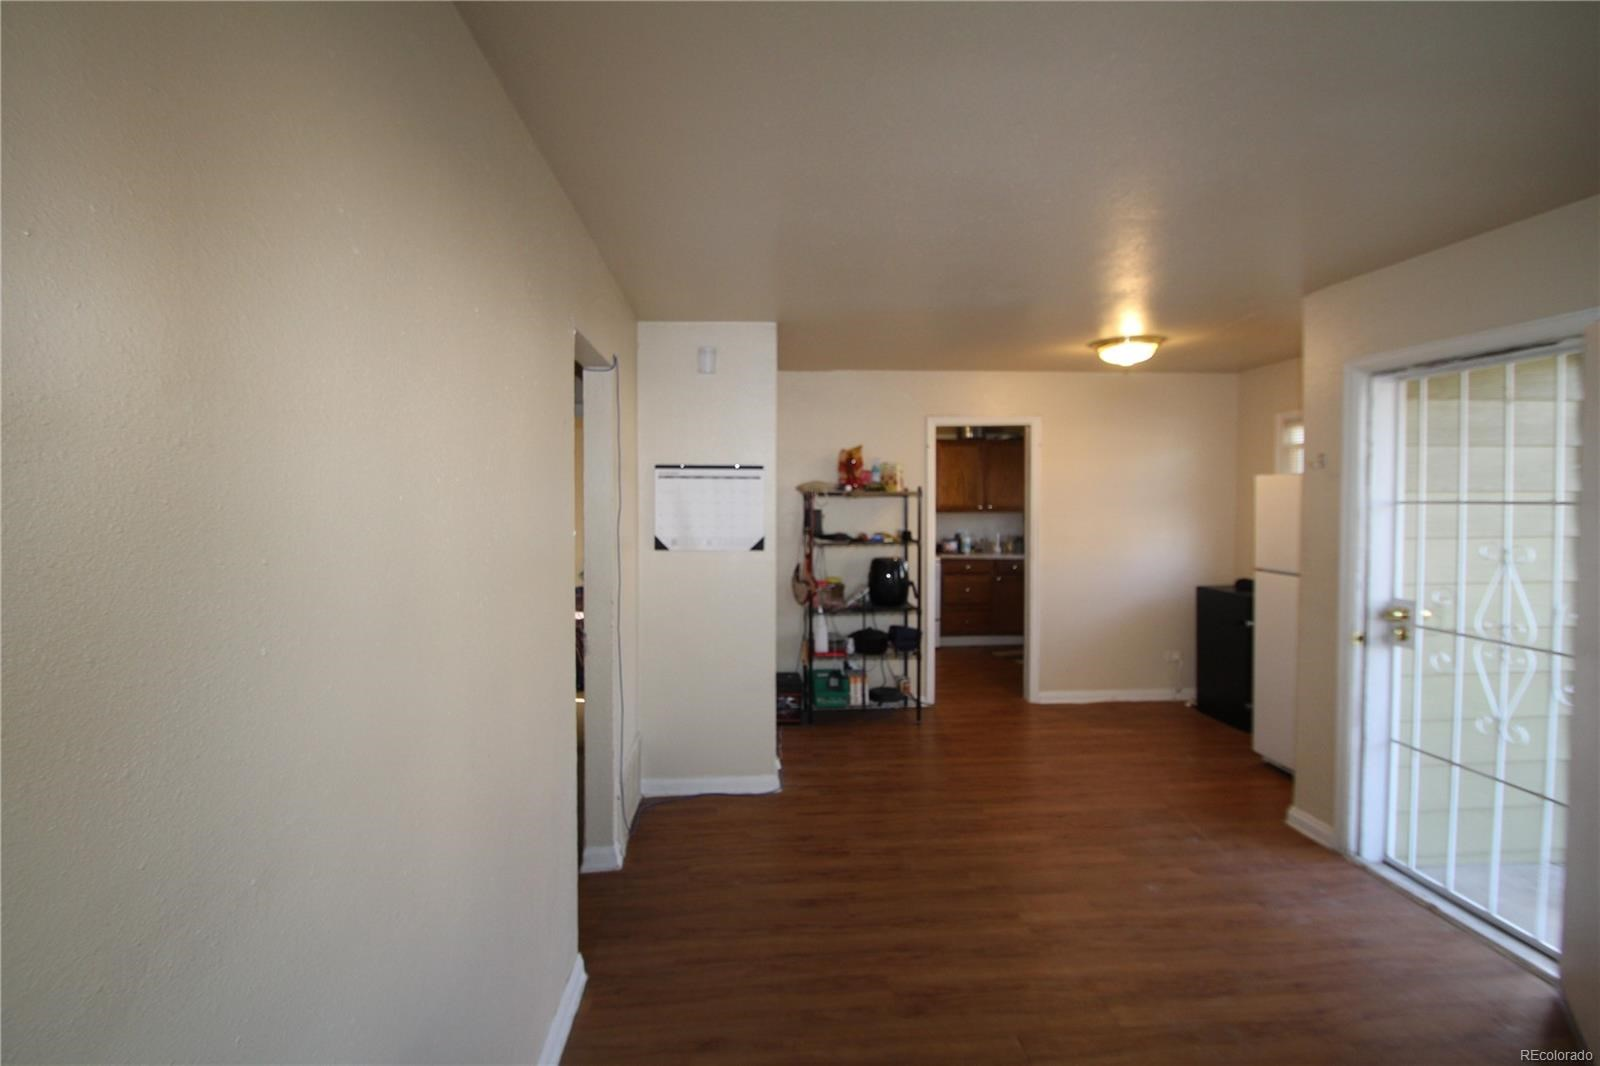 MLS# 5453596 - 1 - 1769  Jamaica Street, Aurora, CO 80010